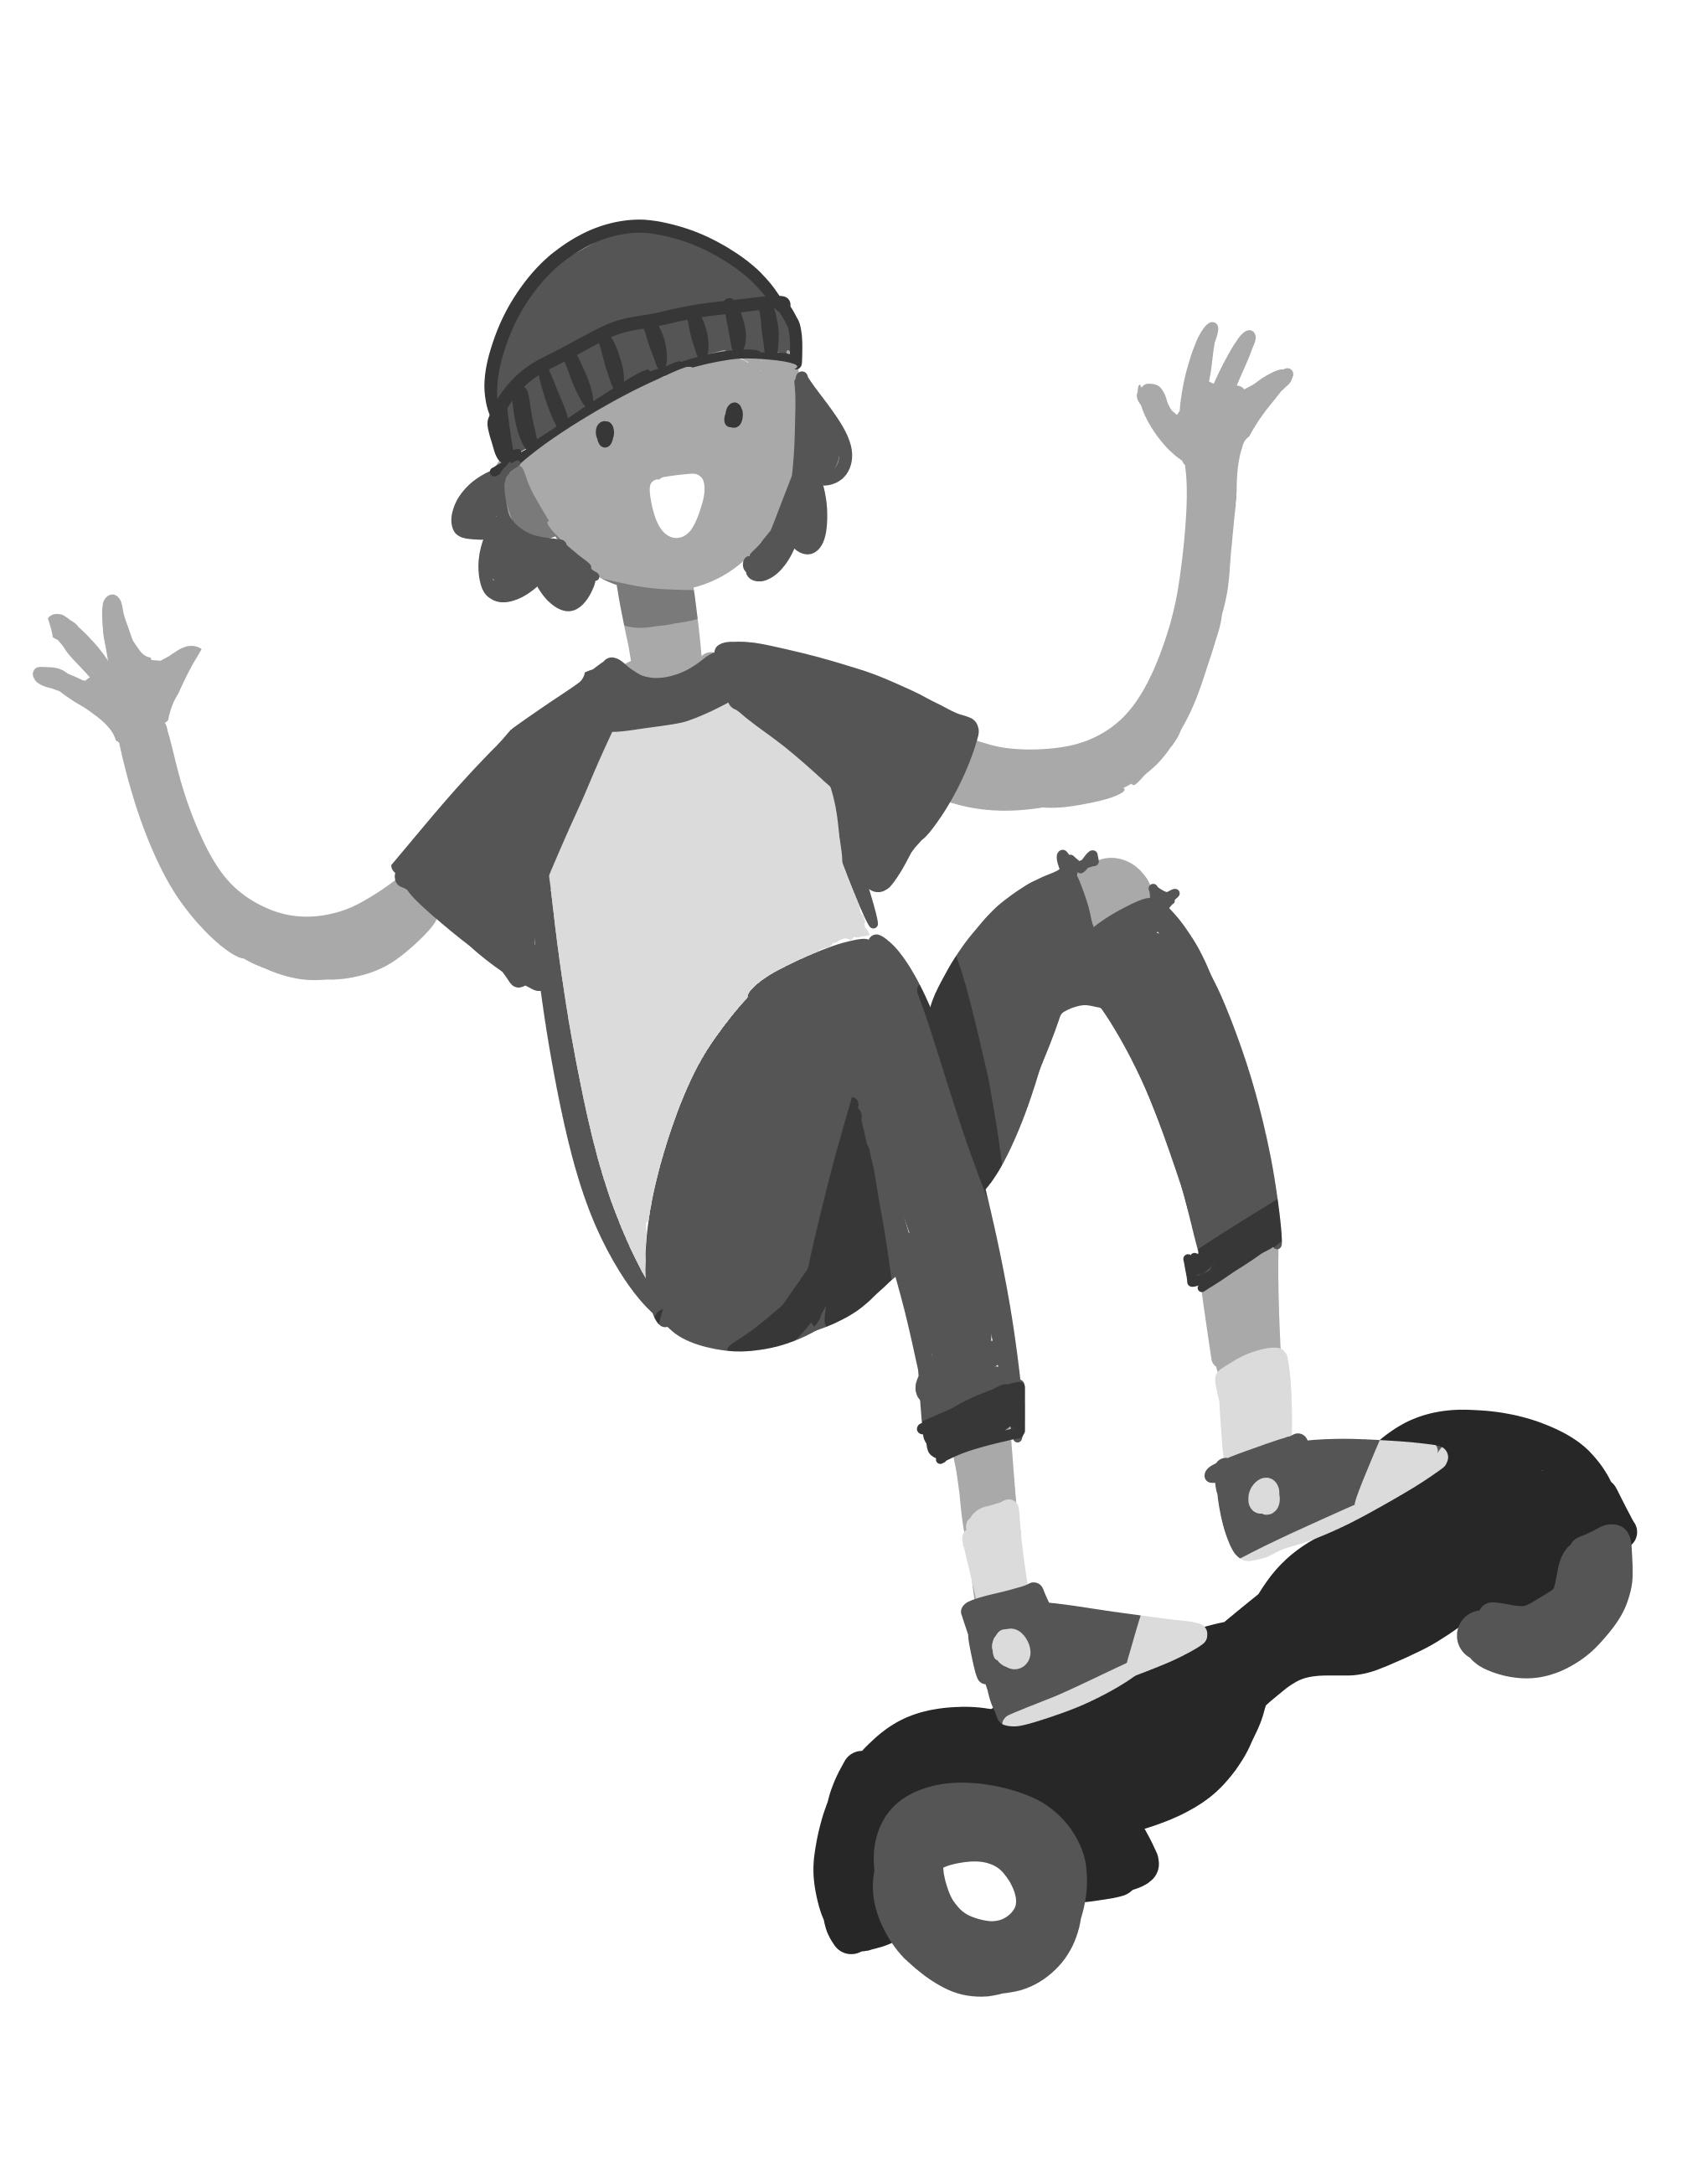 Конкурс на создание персонажа для сайта компании «Экодрифт» фото f_08059e0fc8641e0d.jpg